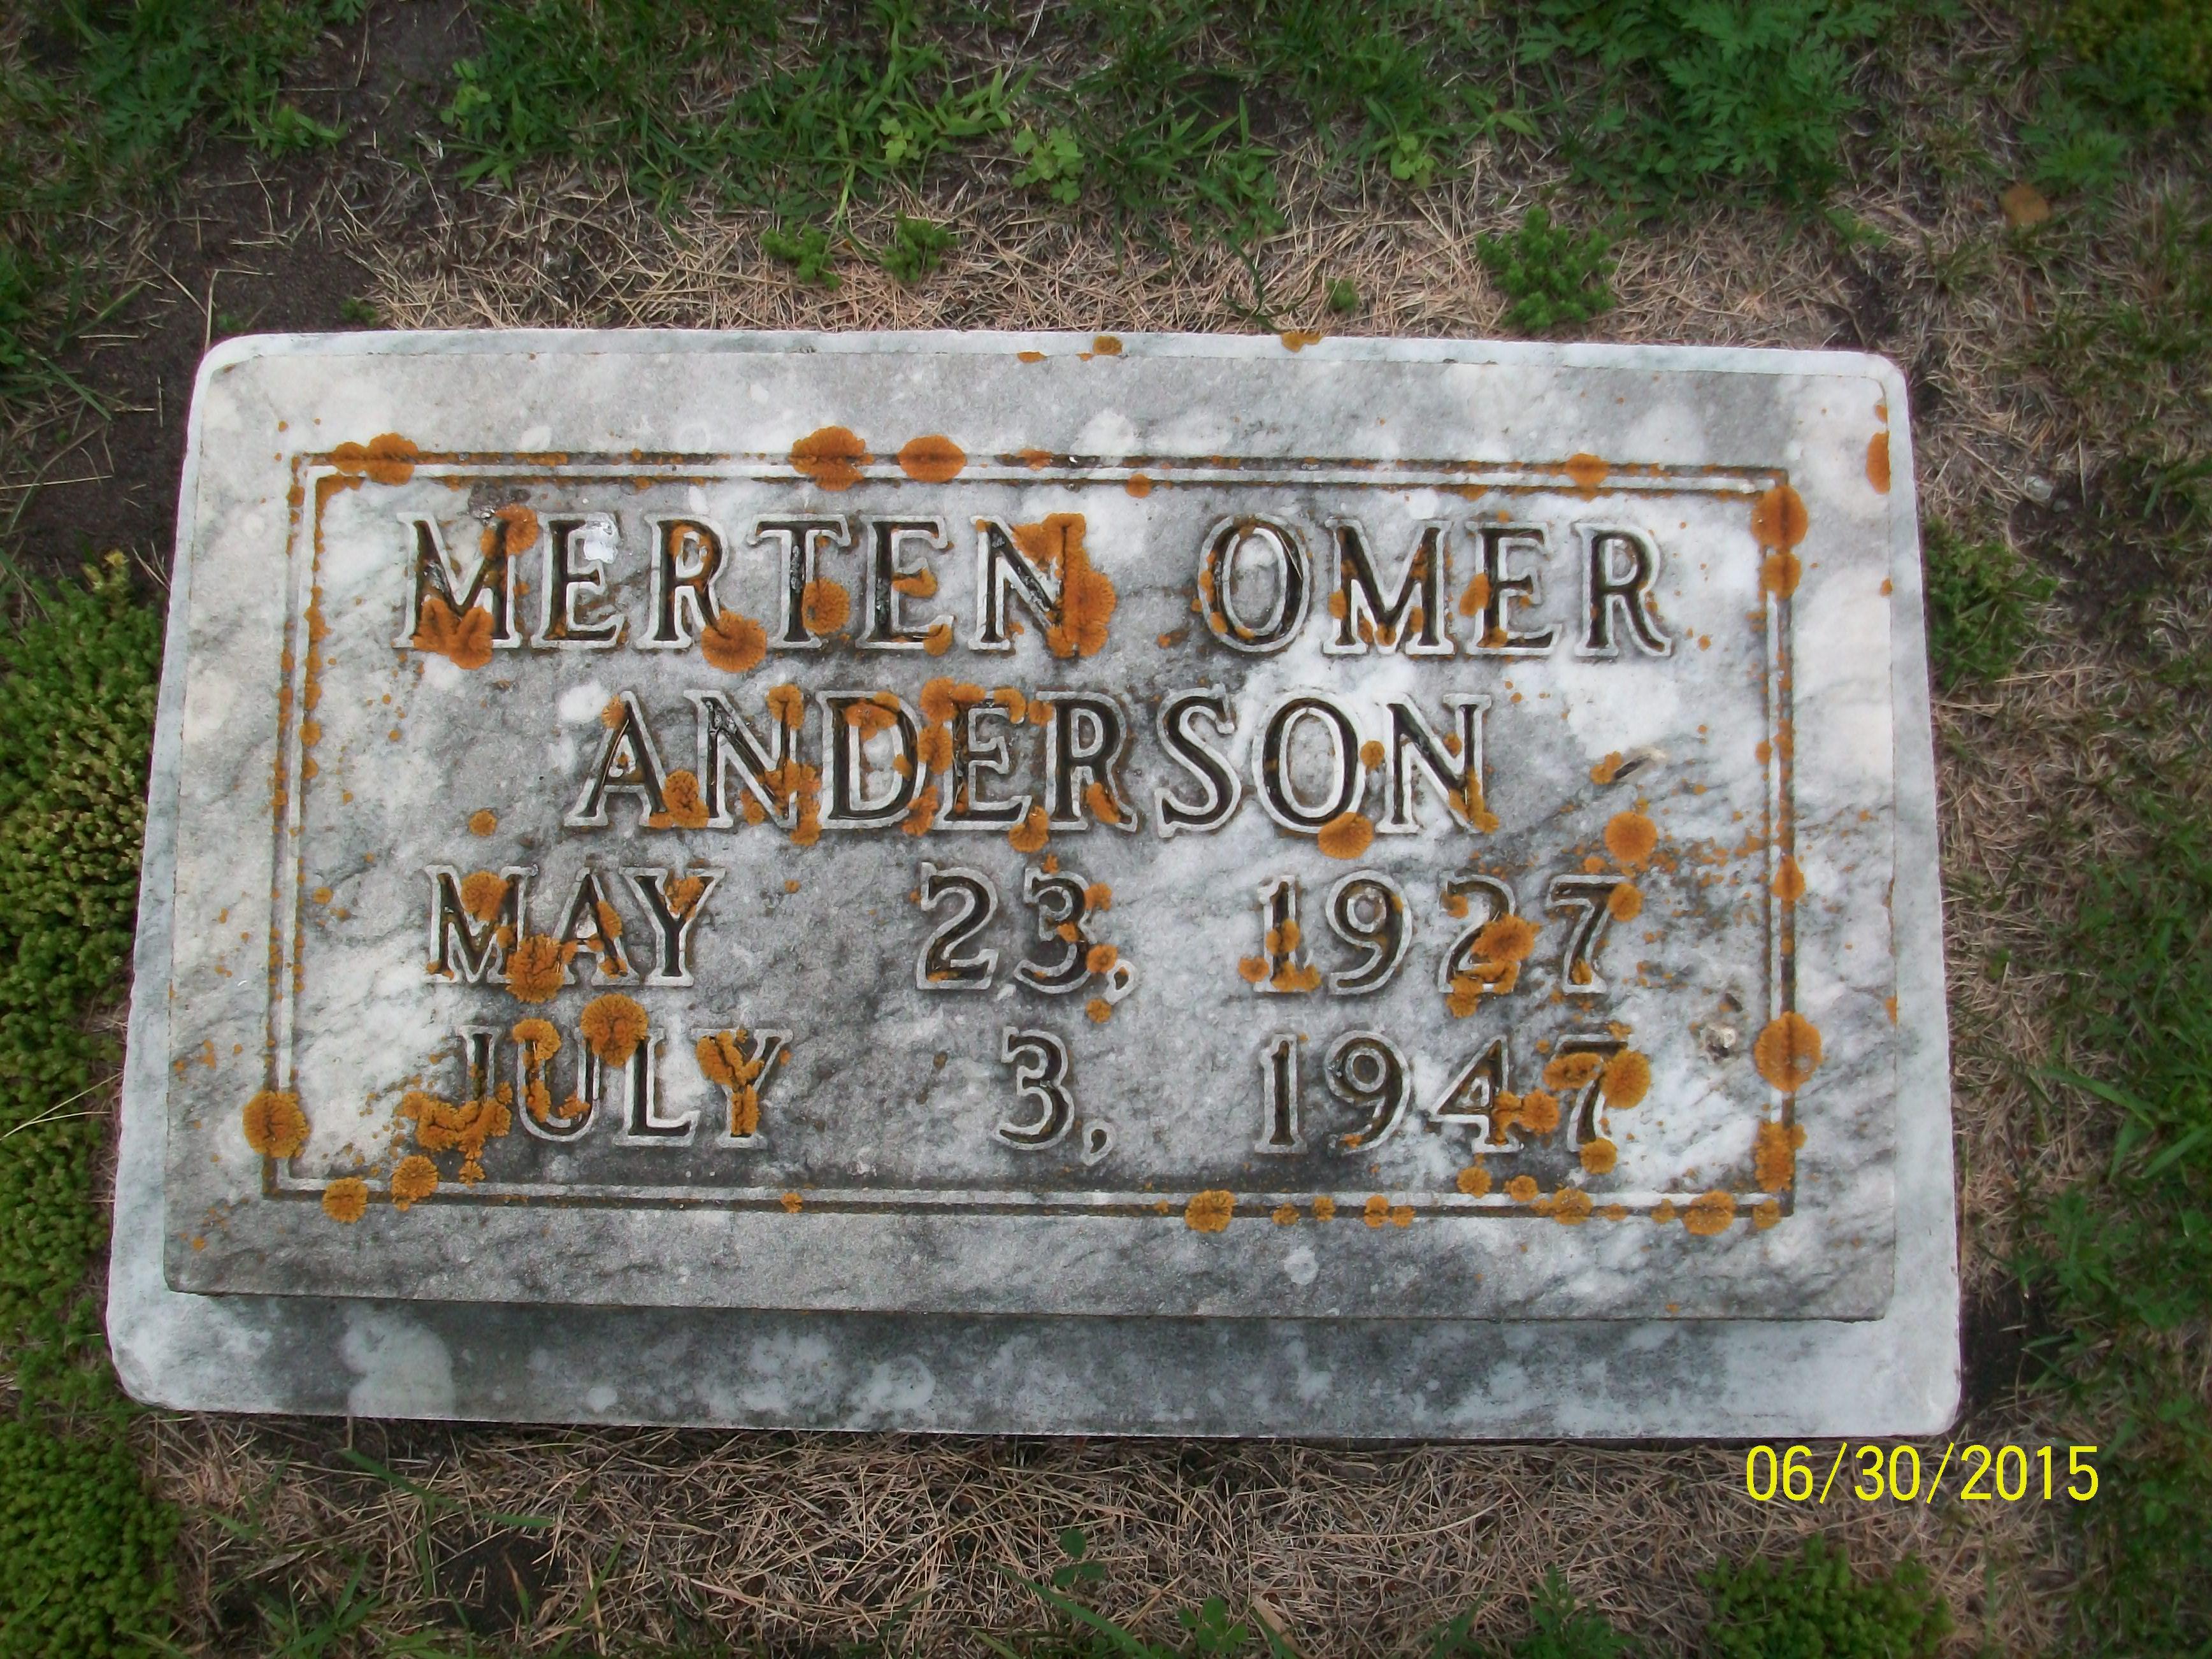 Merton Omer Anderson